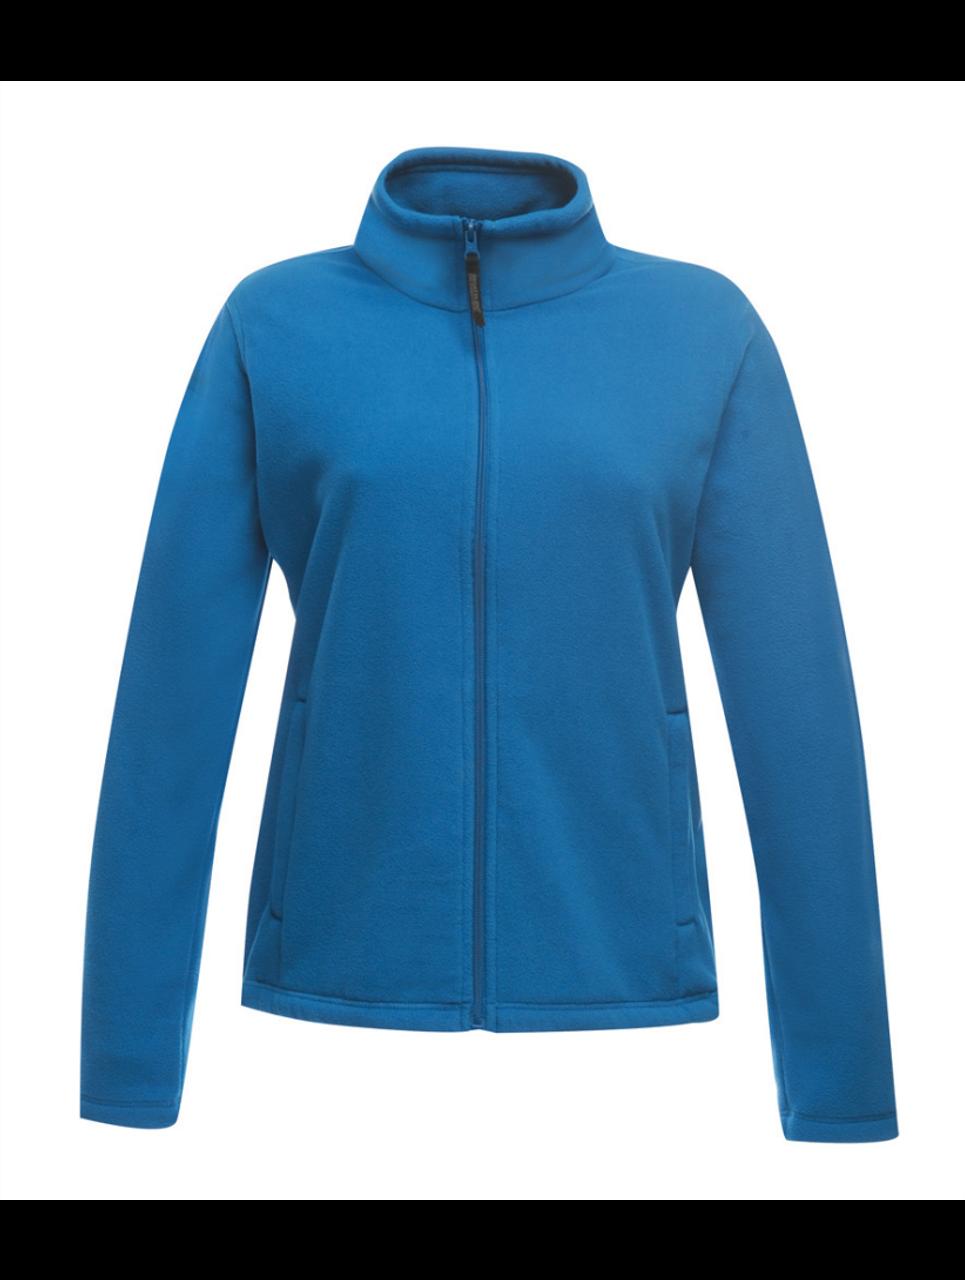 b72c16d5921 Regatta Ladies Micro Fleece Jacket